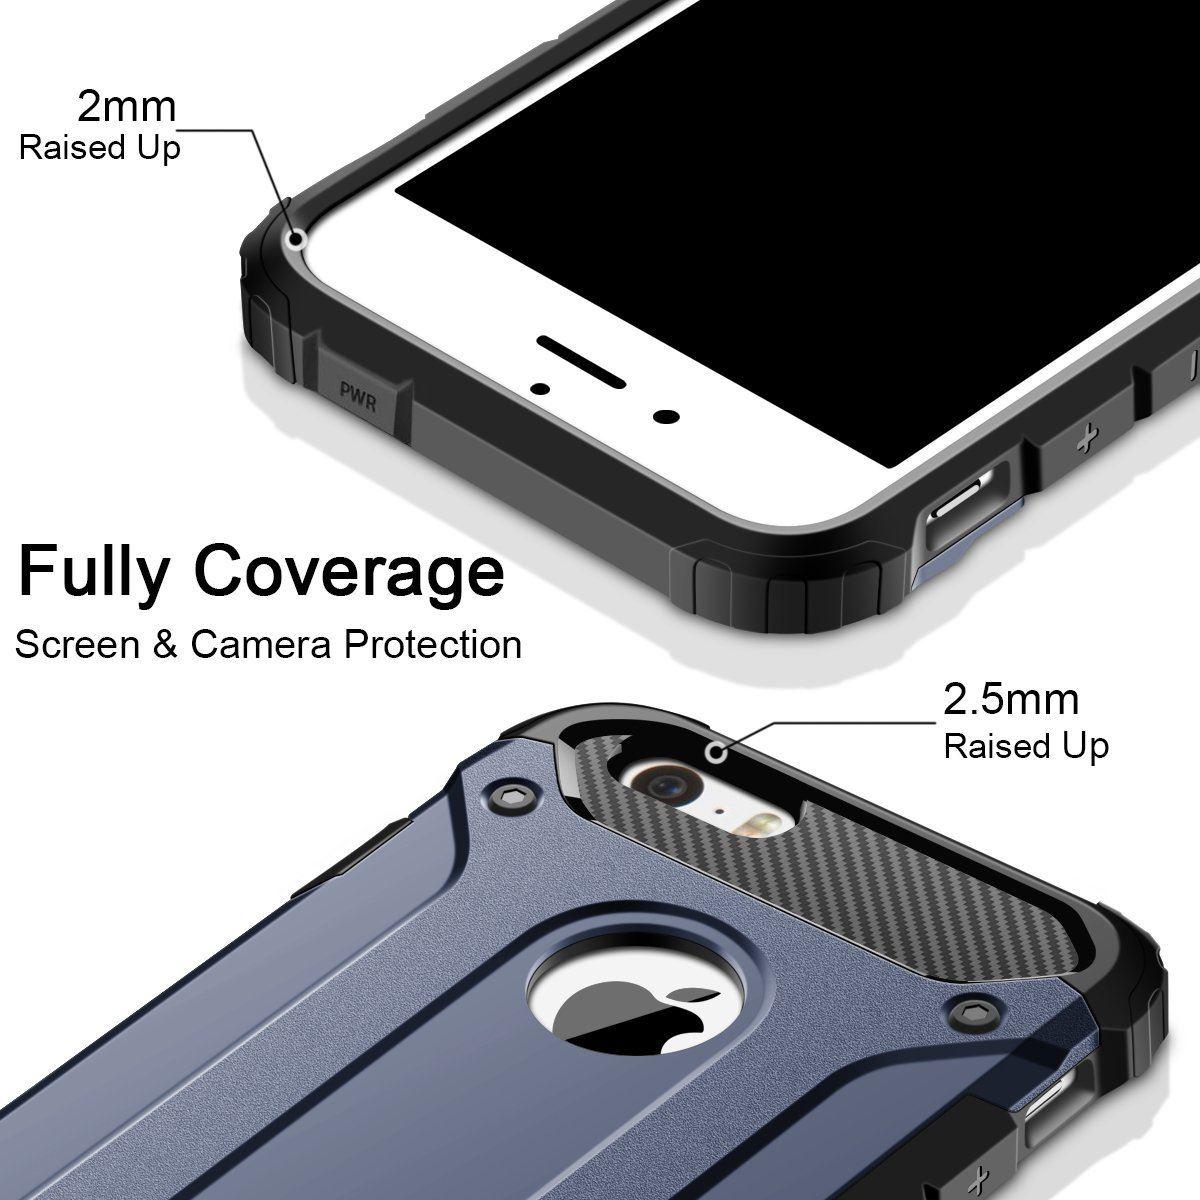 thumbnail 38 - For Apple iPhone 11 Pro Max XR Xs X 8 7 Plus 6 5 Se Case Cover Impact Heavy Duty